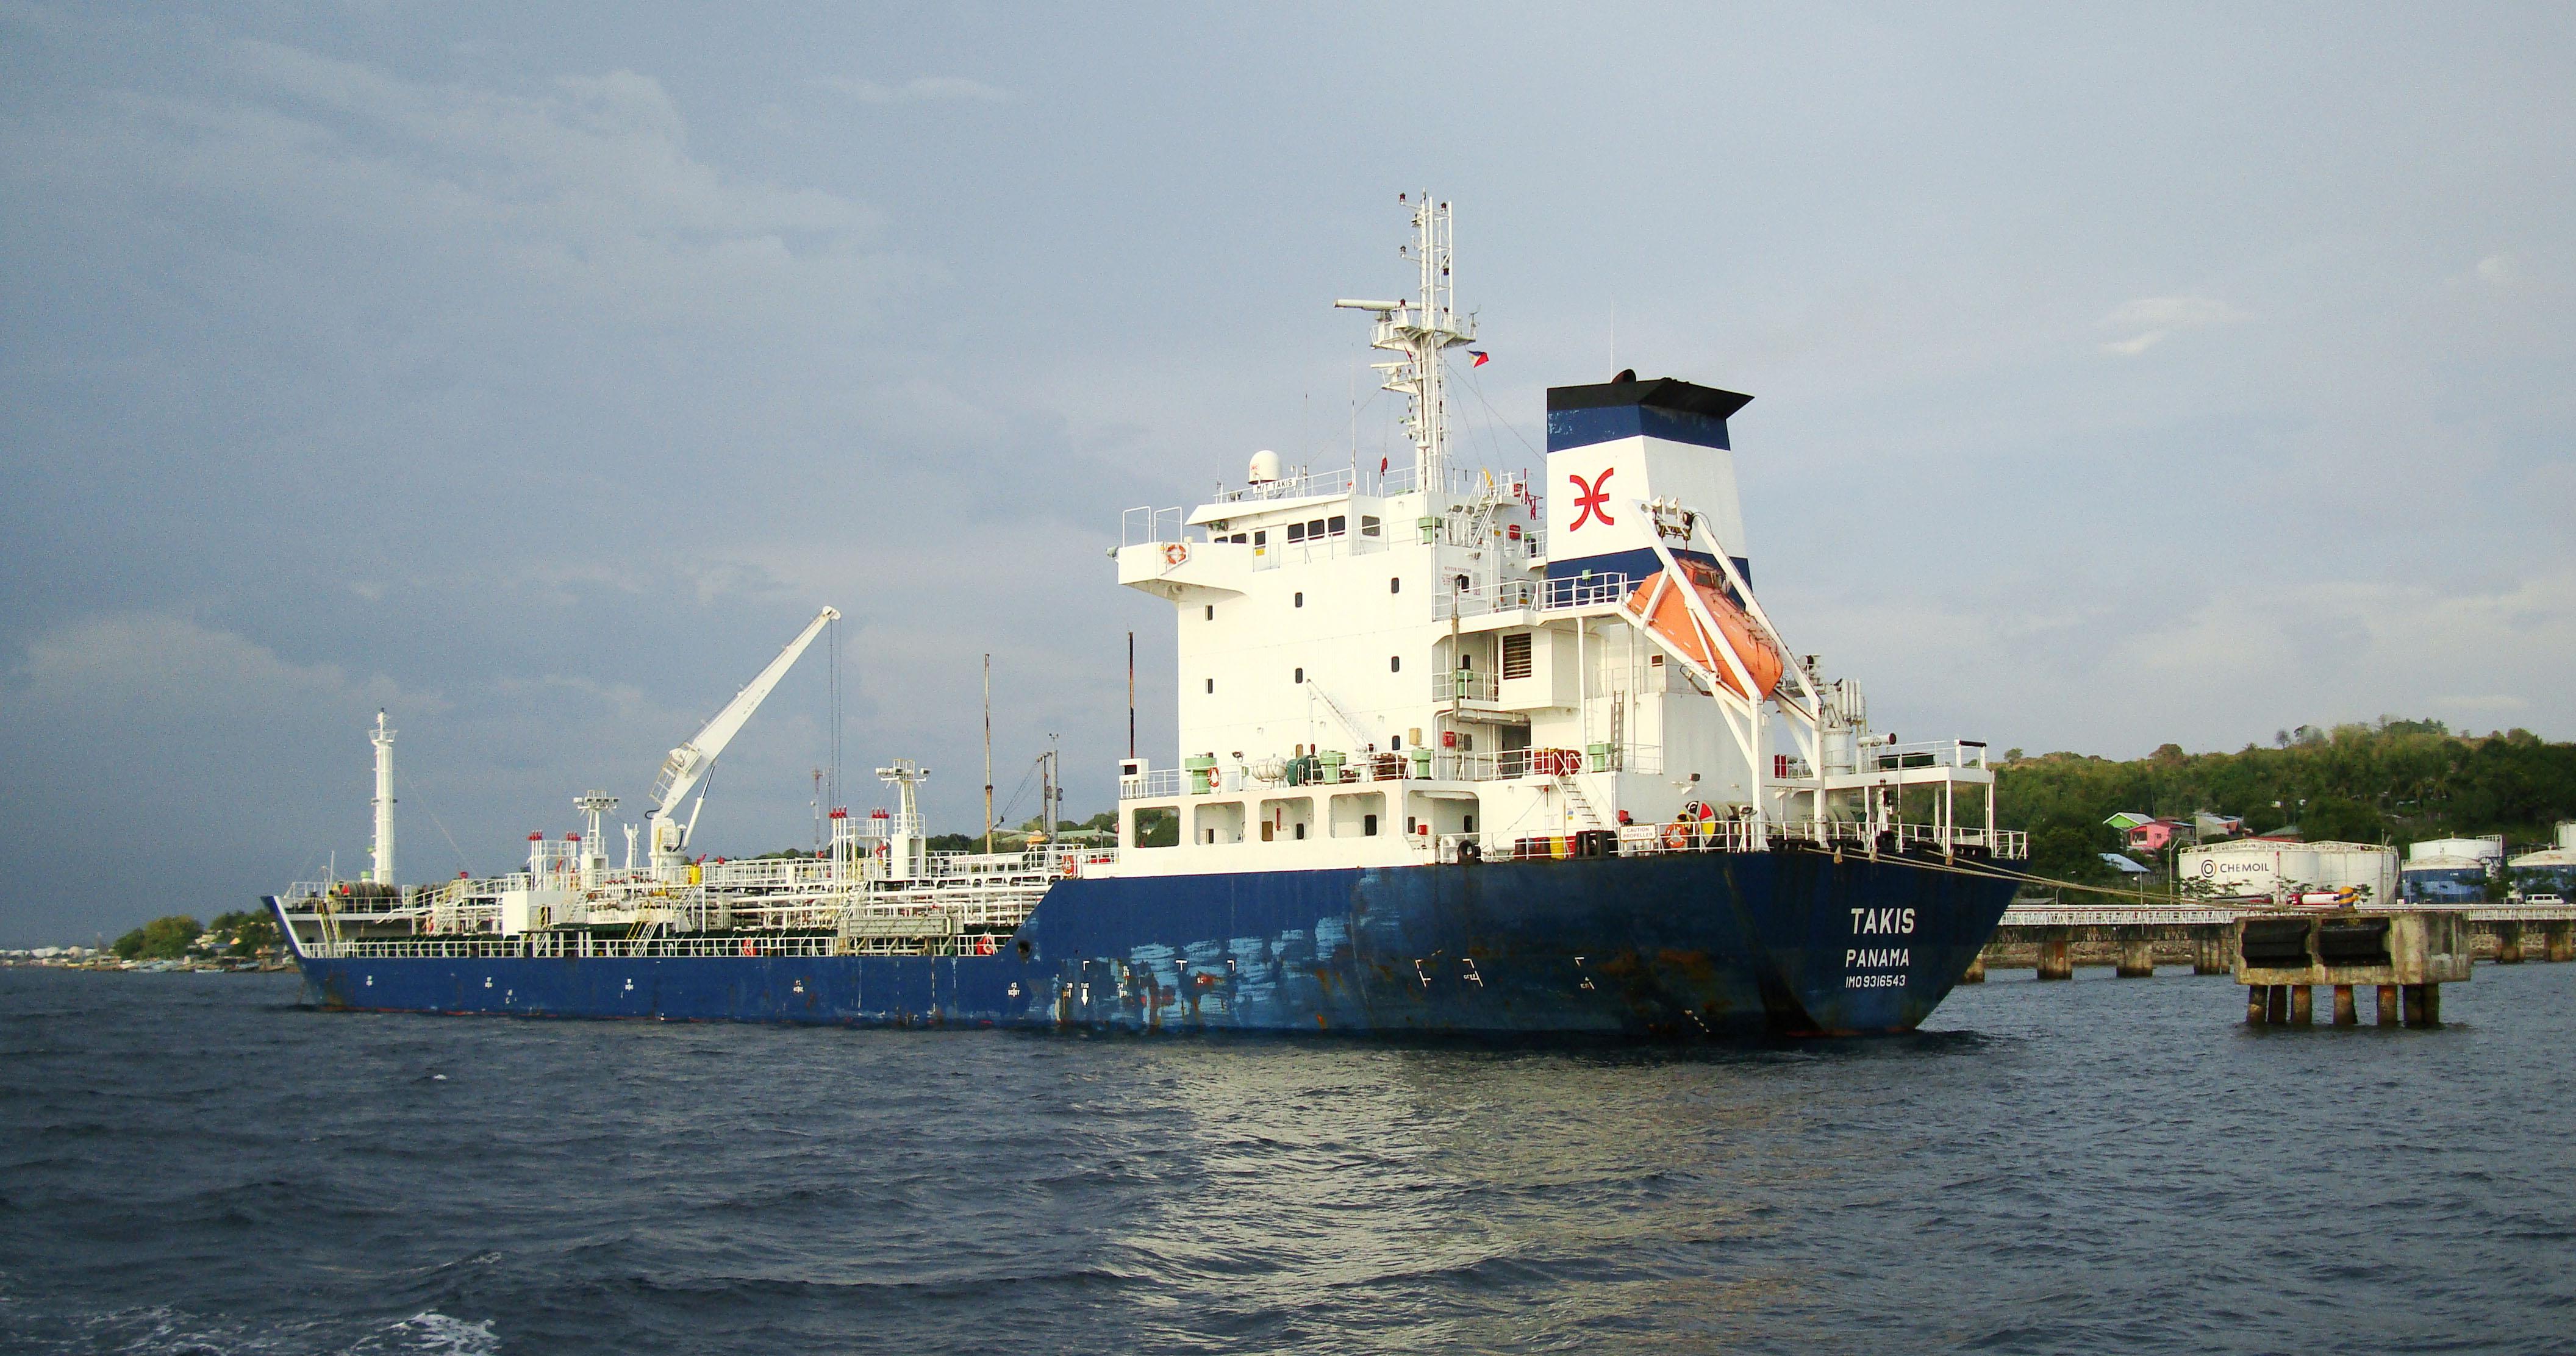 IMO 9316543 MV Takis Panamanian Batangus Philippines 04